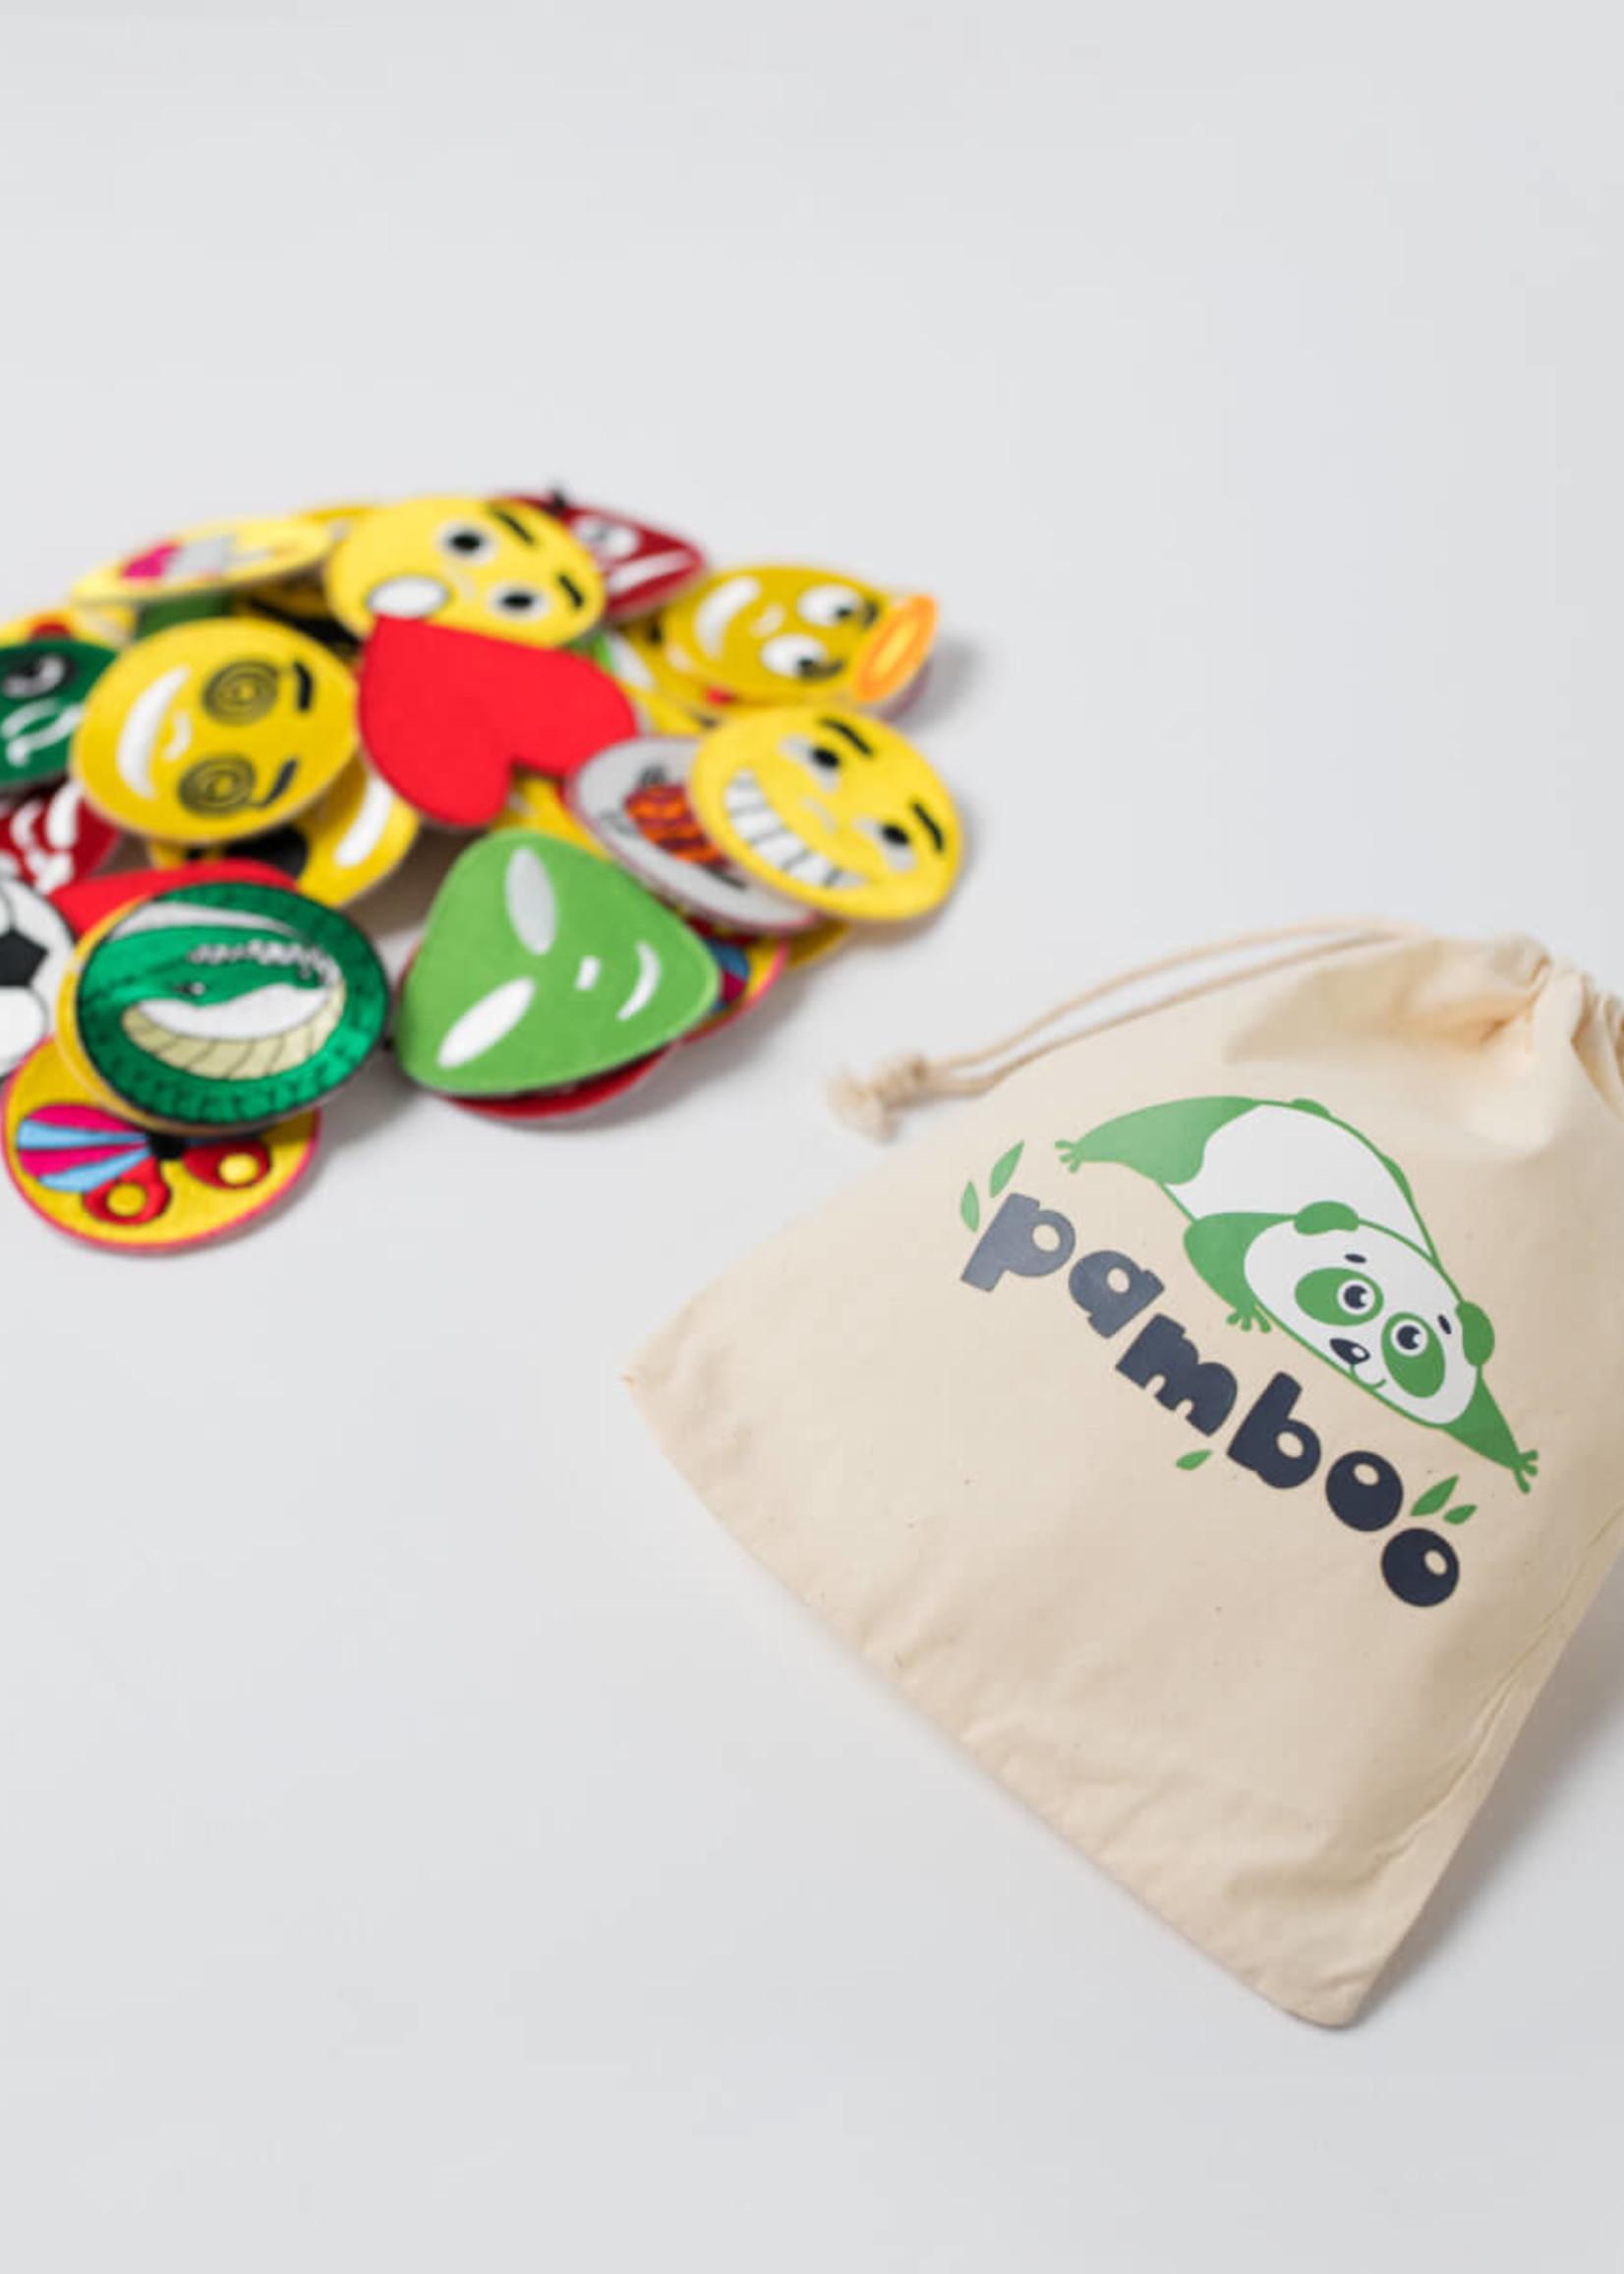 Pamboo Pamboo-ss21 set with 23 emoji